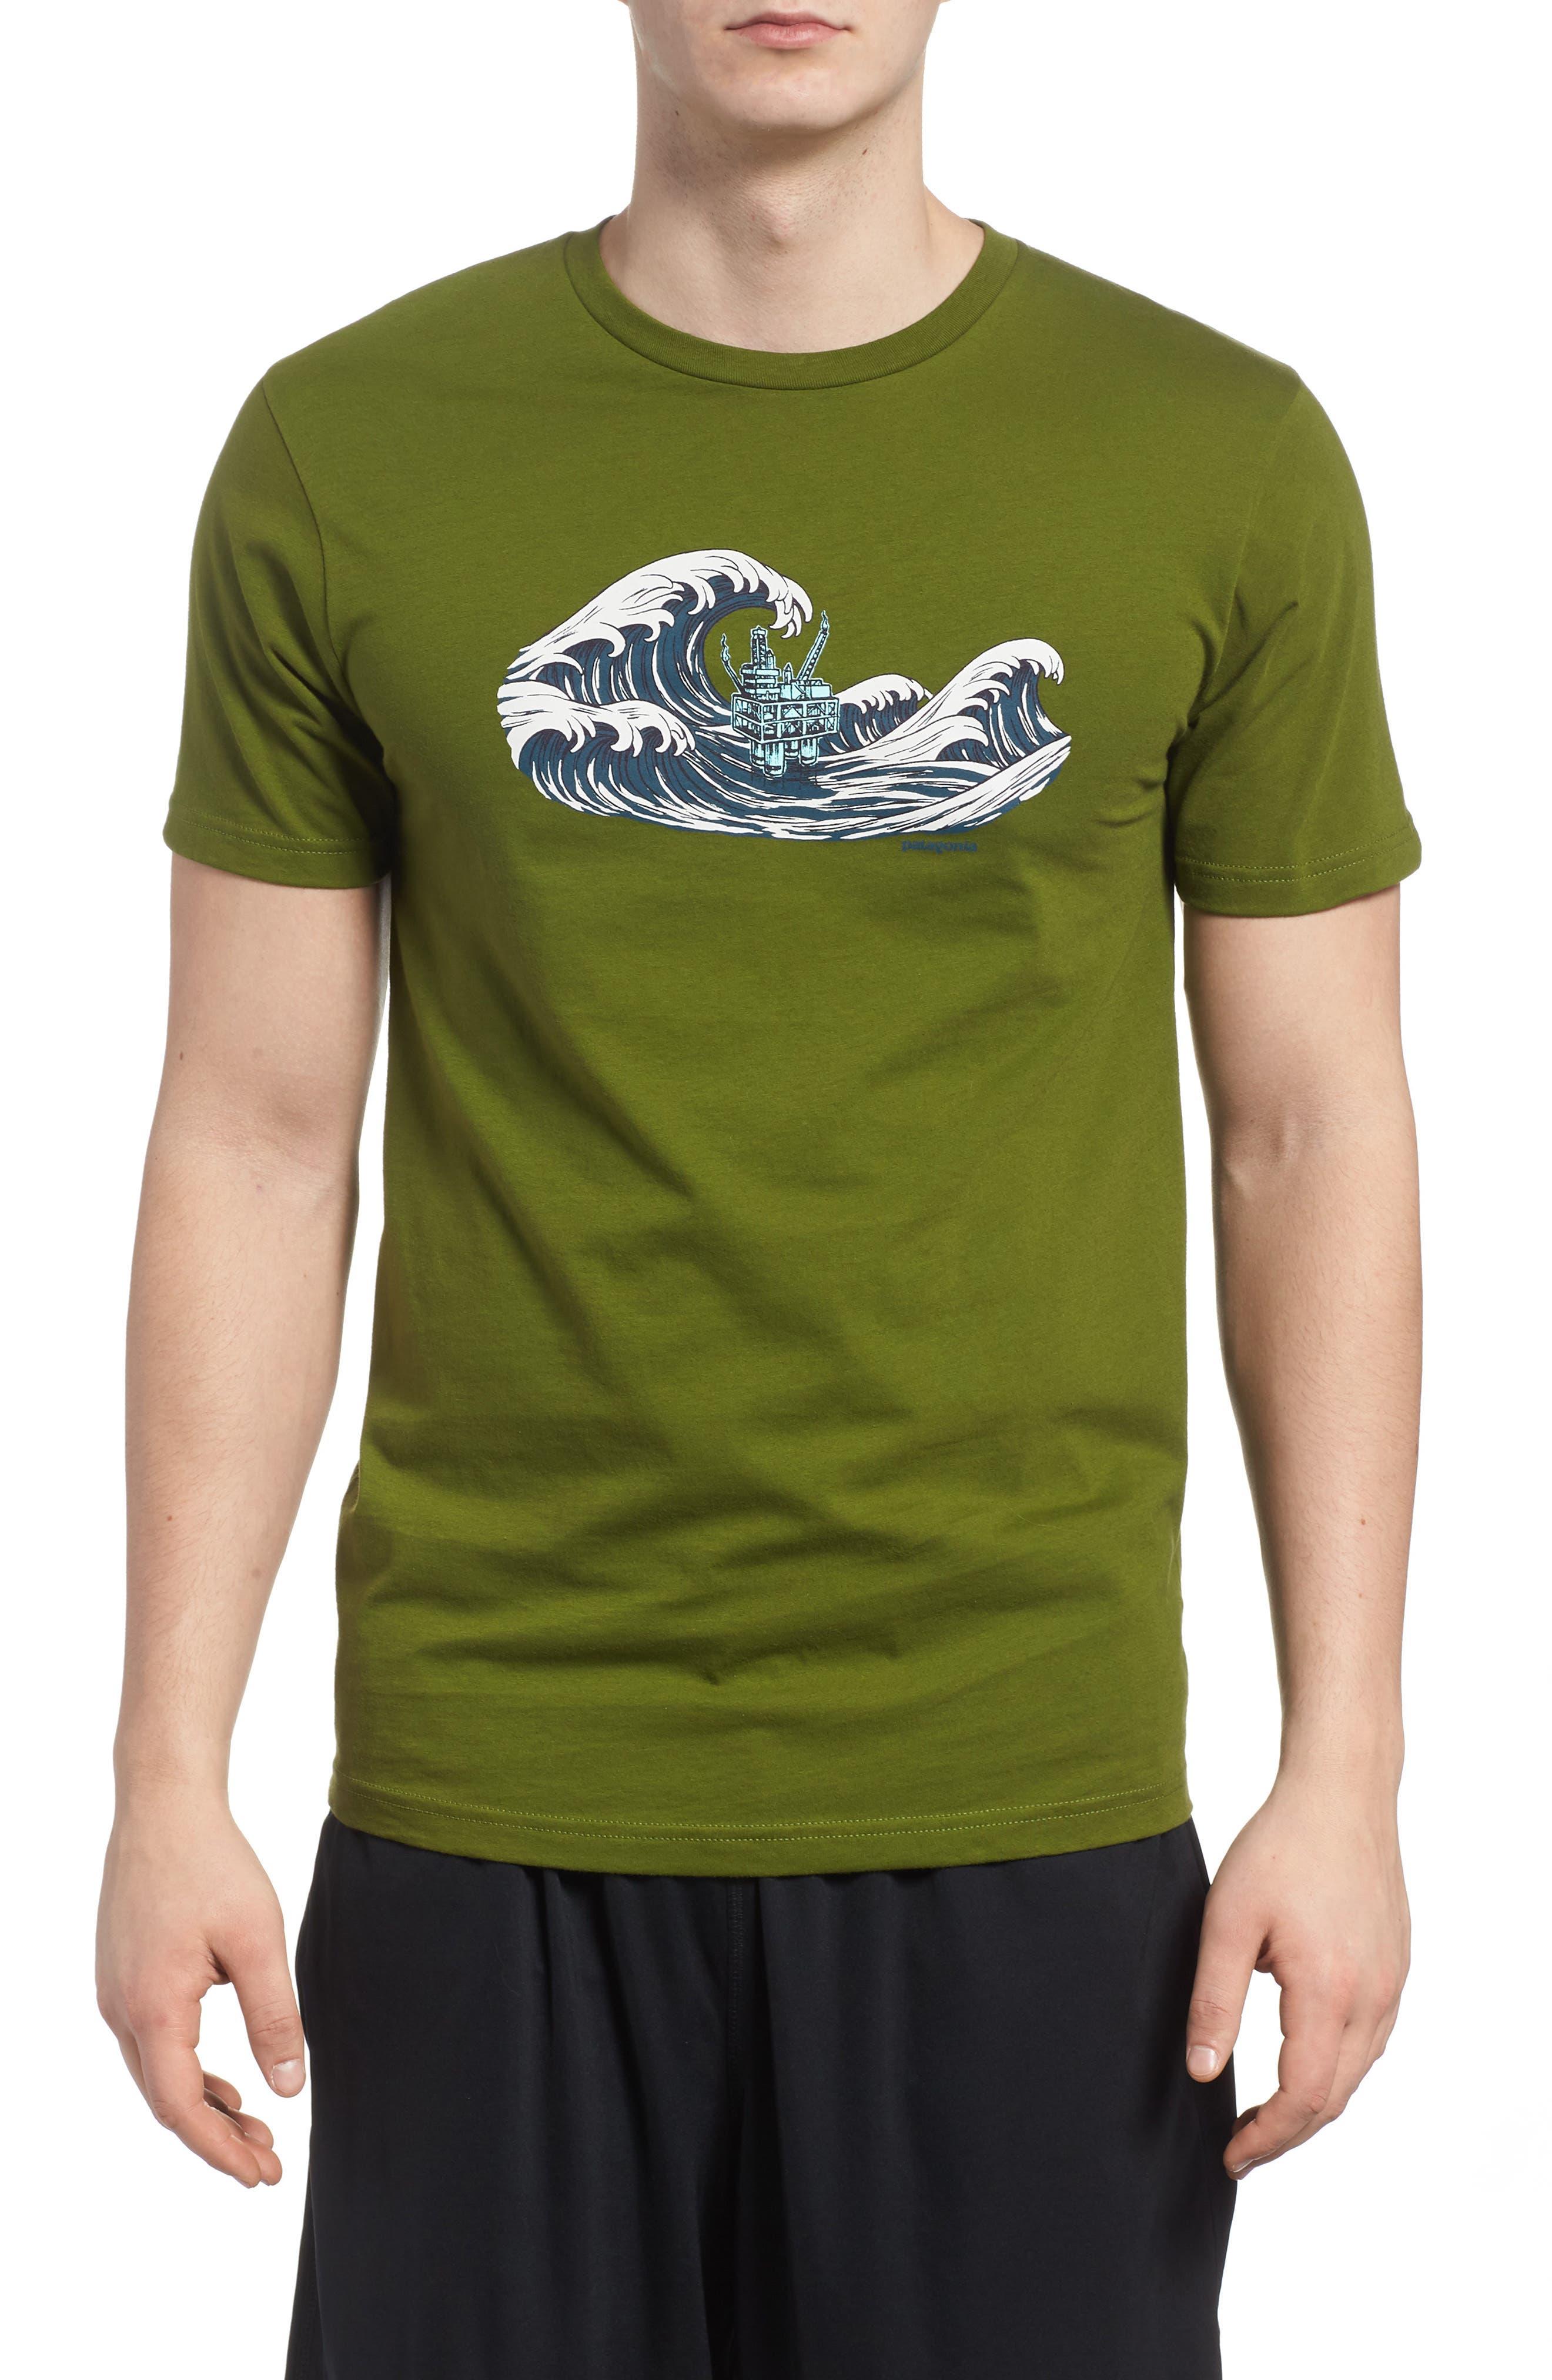 PATAGONIA Oily Olas Slim Fit Organic Cotton T-Shirt, Main, color, 300